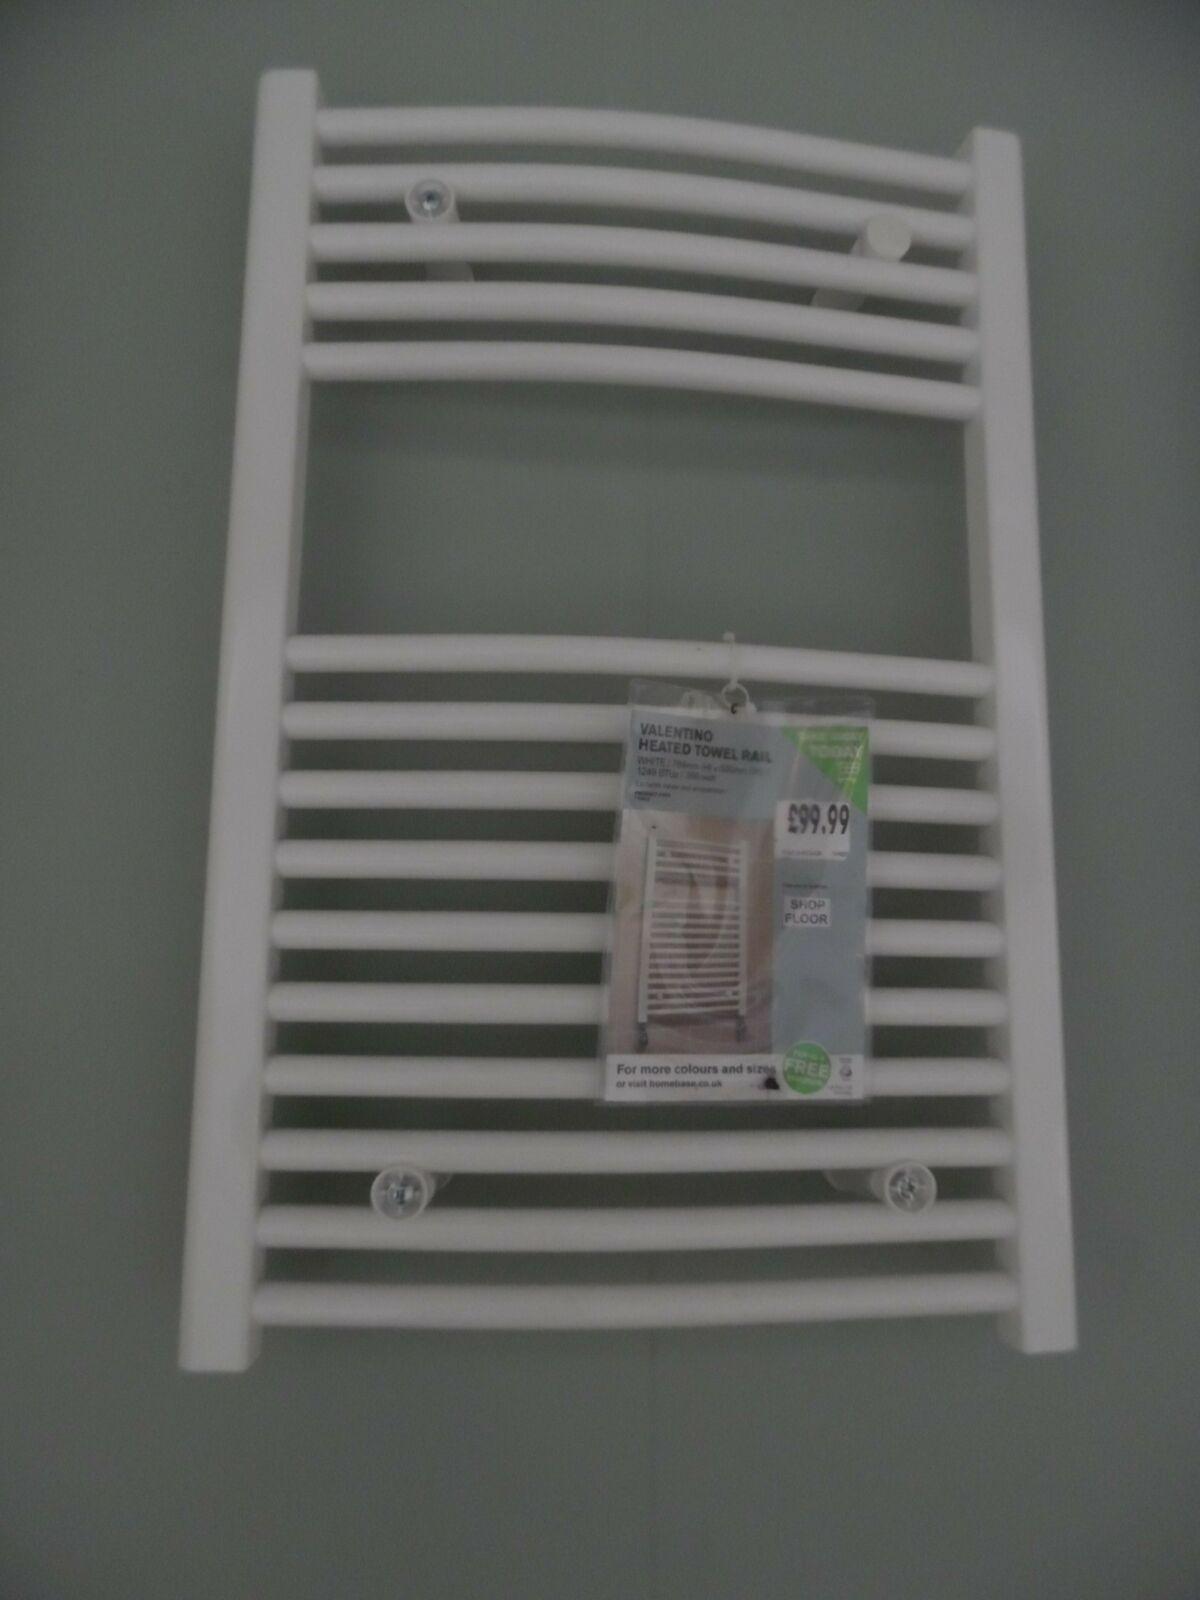 Ex Display Homebase Valentino Heated Towel Rail - White 764 x 500mm